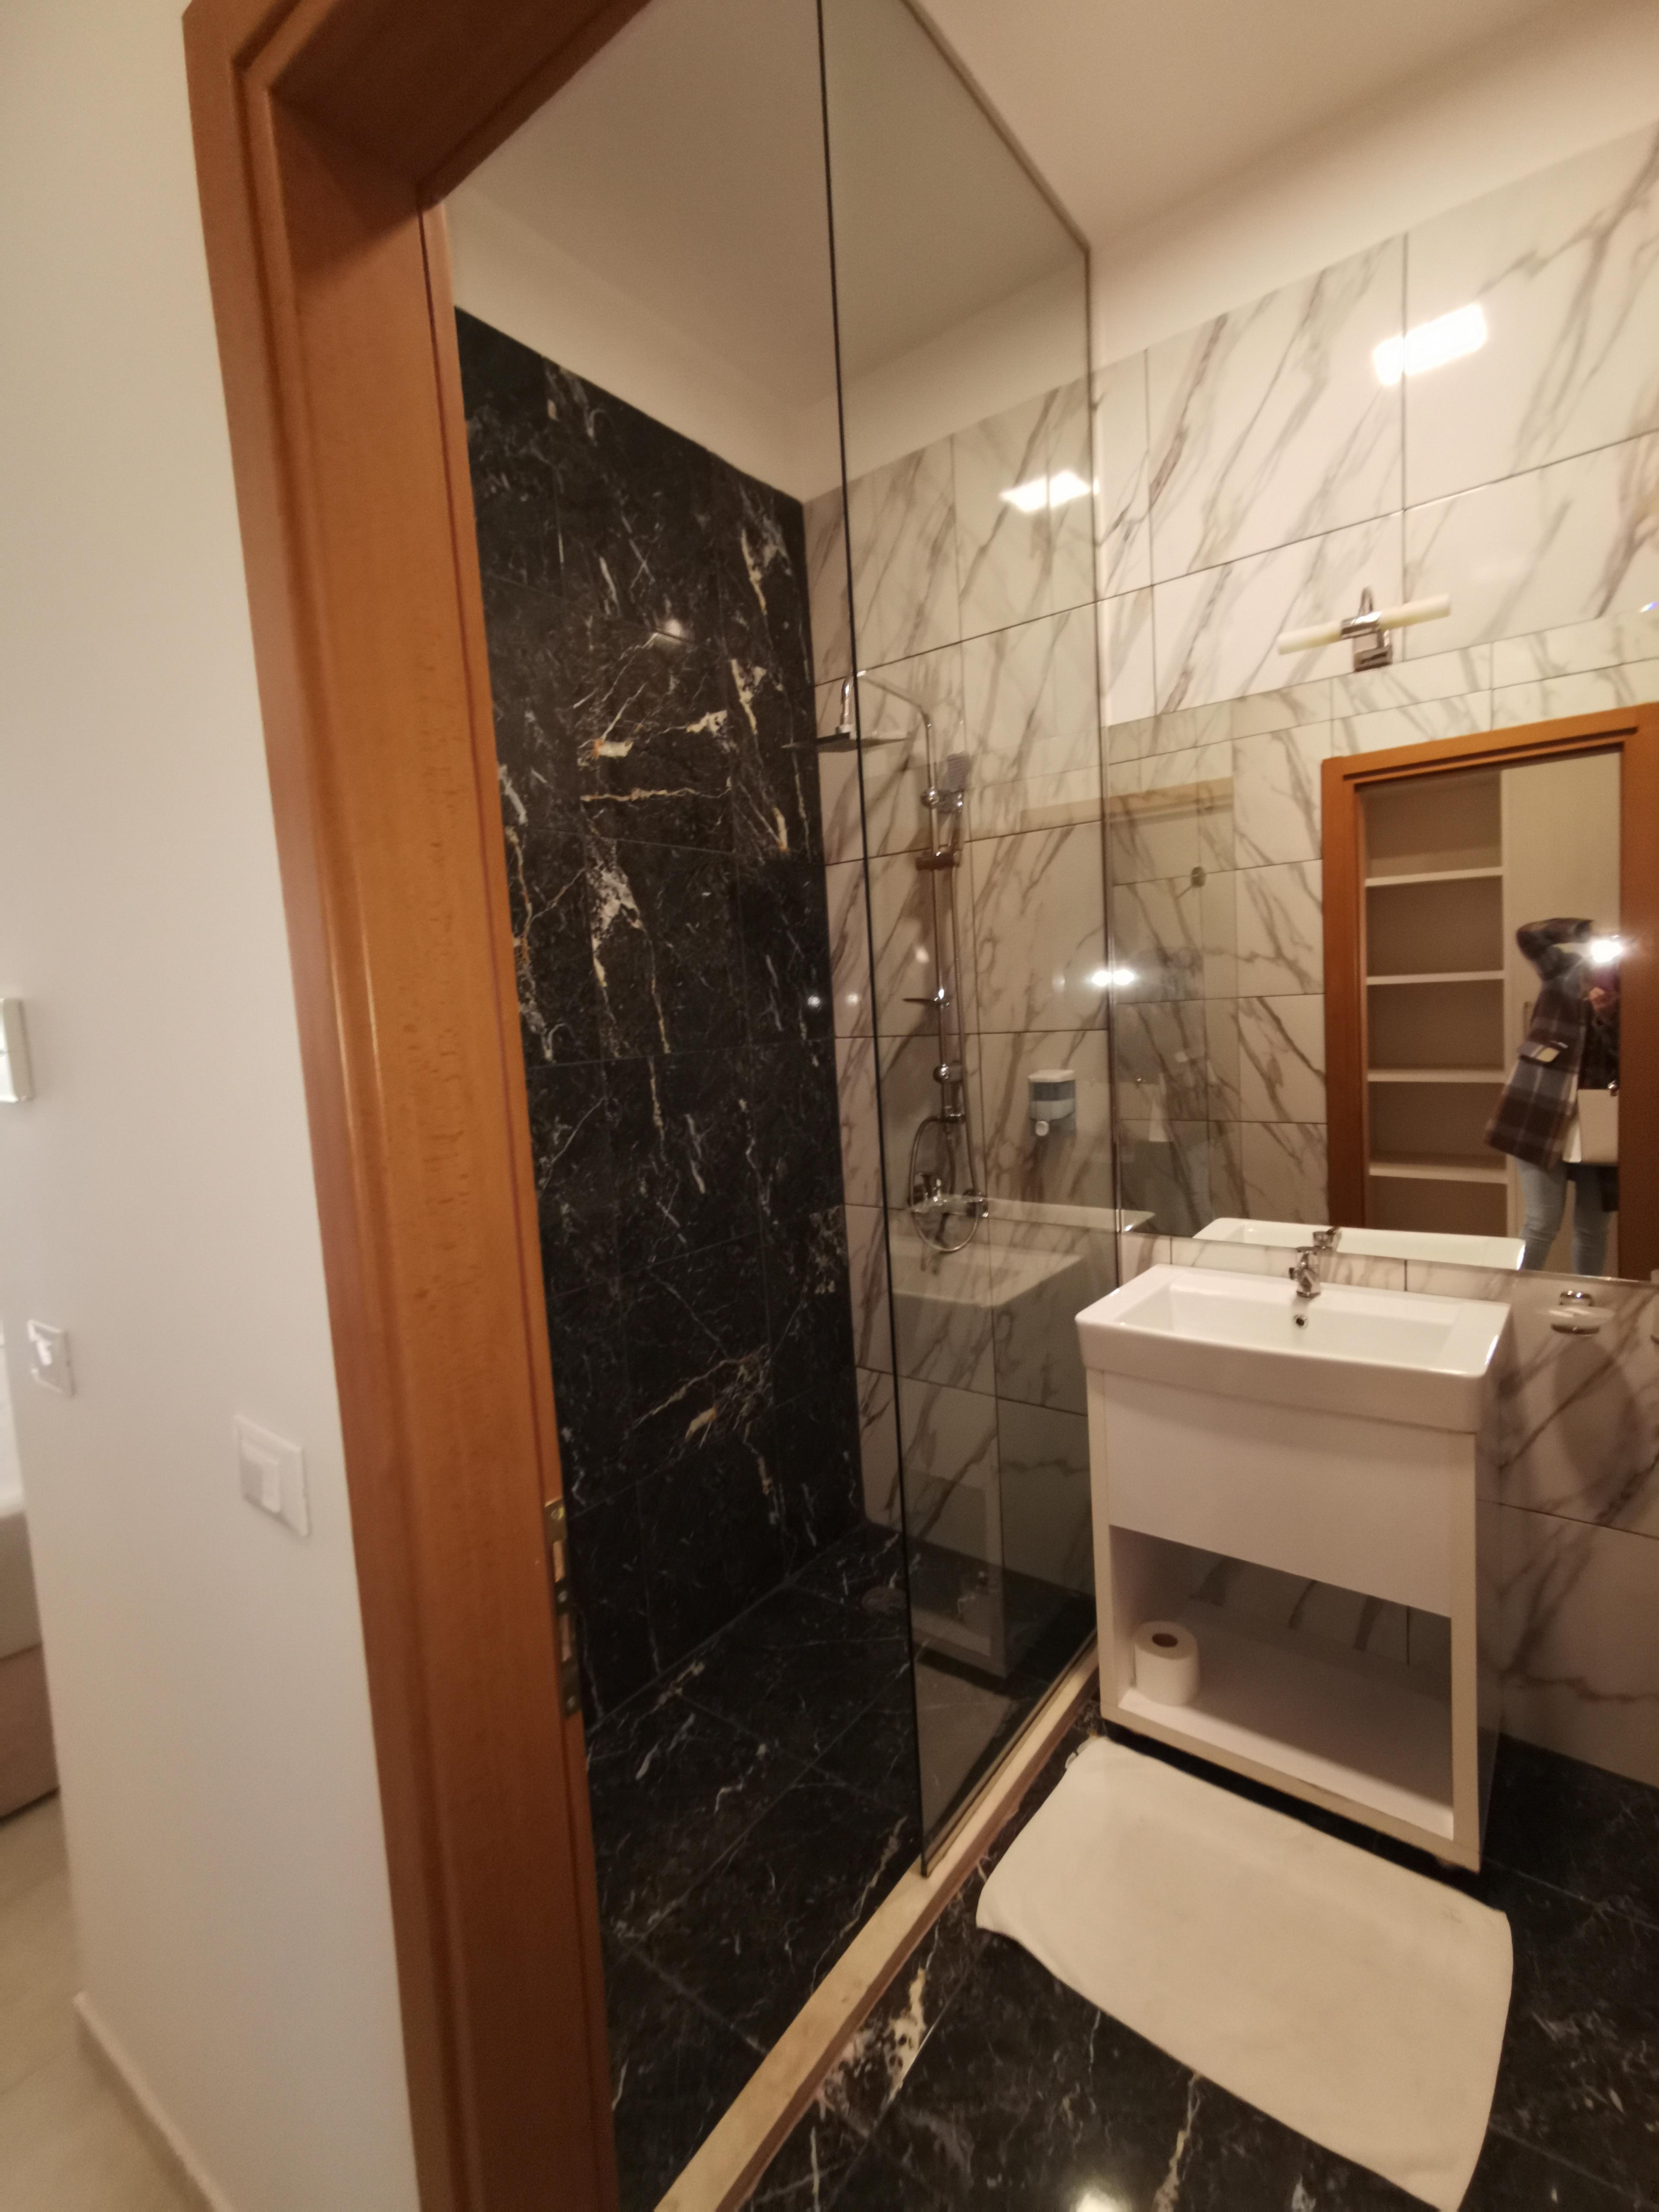 Letovanje Albanija autobusom, Drač Hotel Horizont,toalet